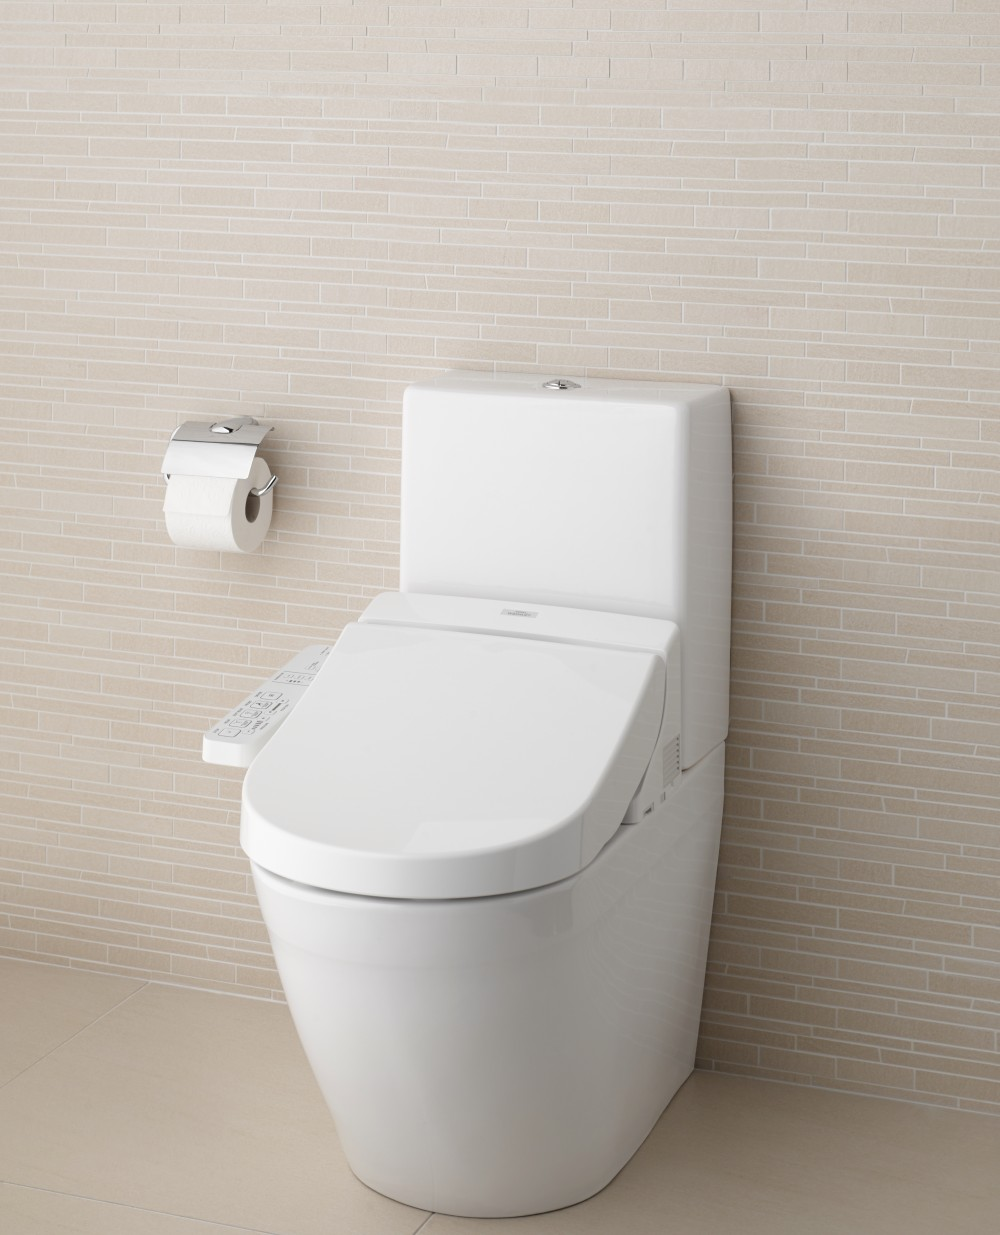 toilet bidet combo japanese japanese toilet toto. Black Bedroom Furniture Sets. Home Design Ideas